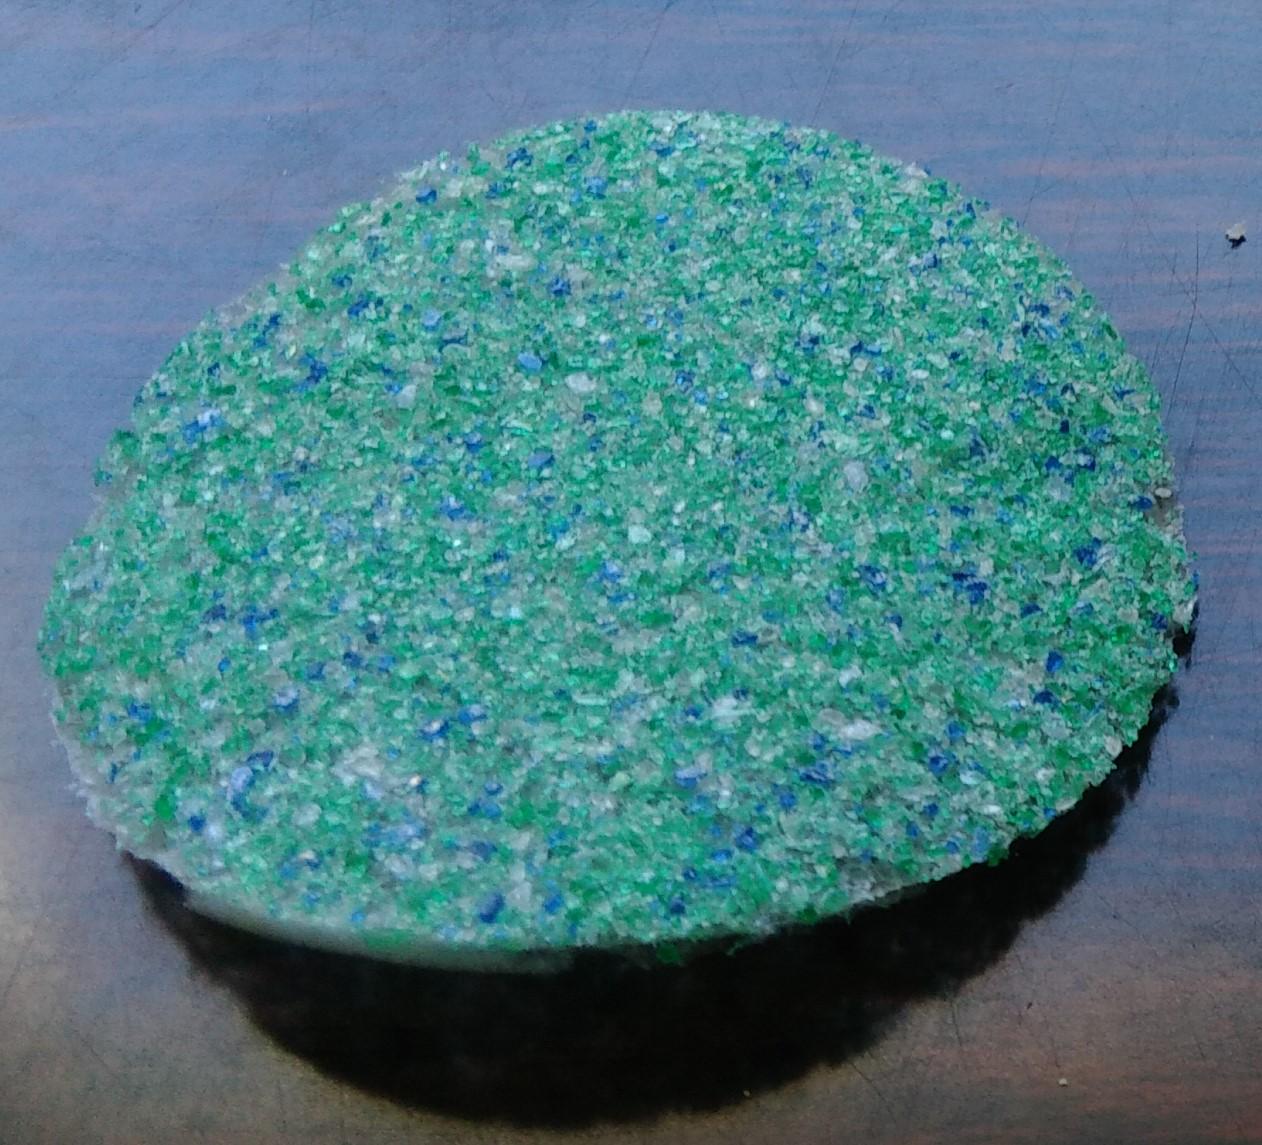 materialemicroplasticheunibz2.jpg